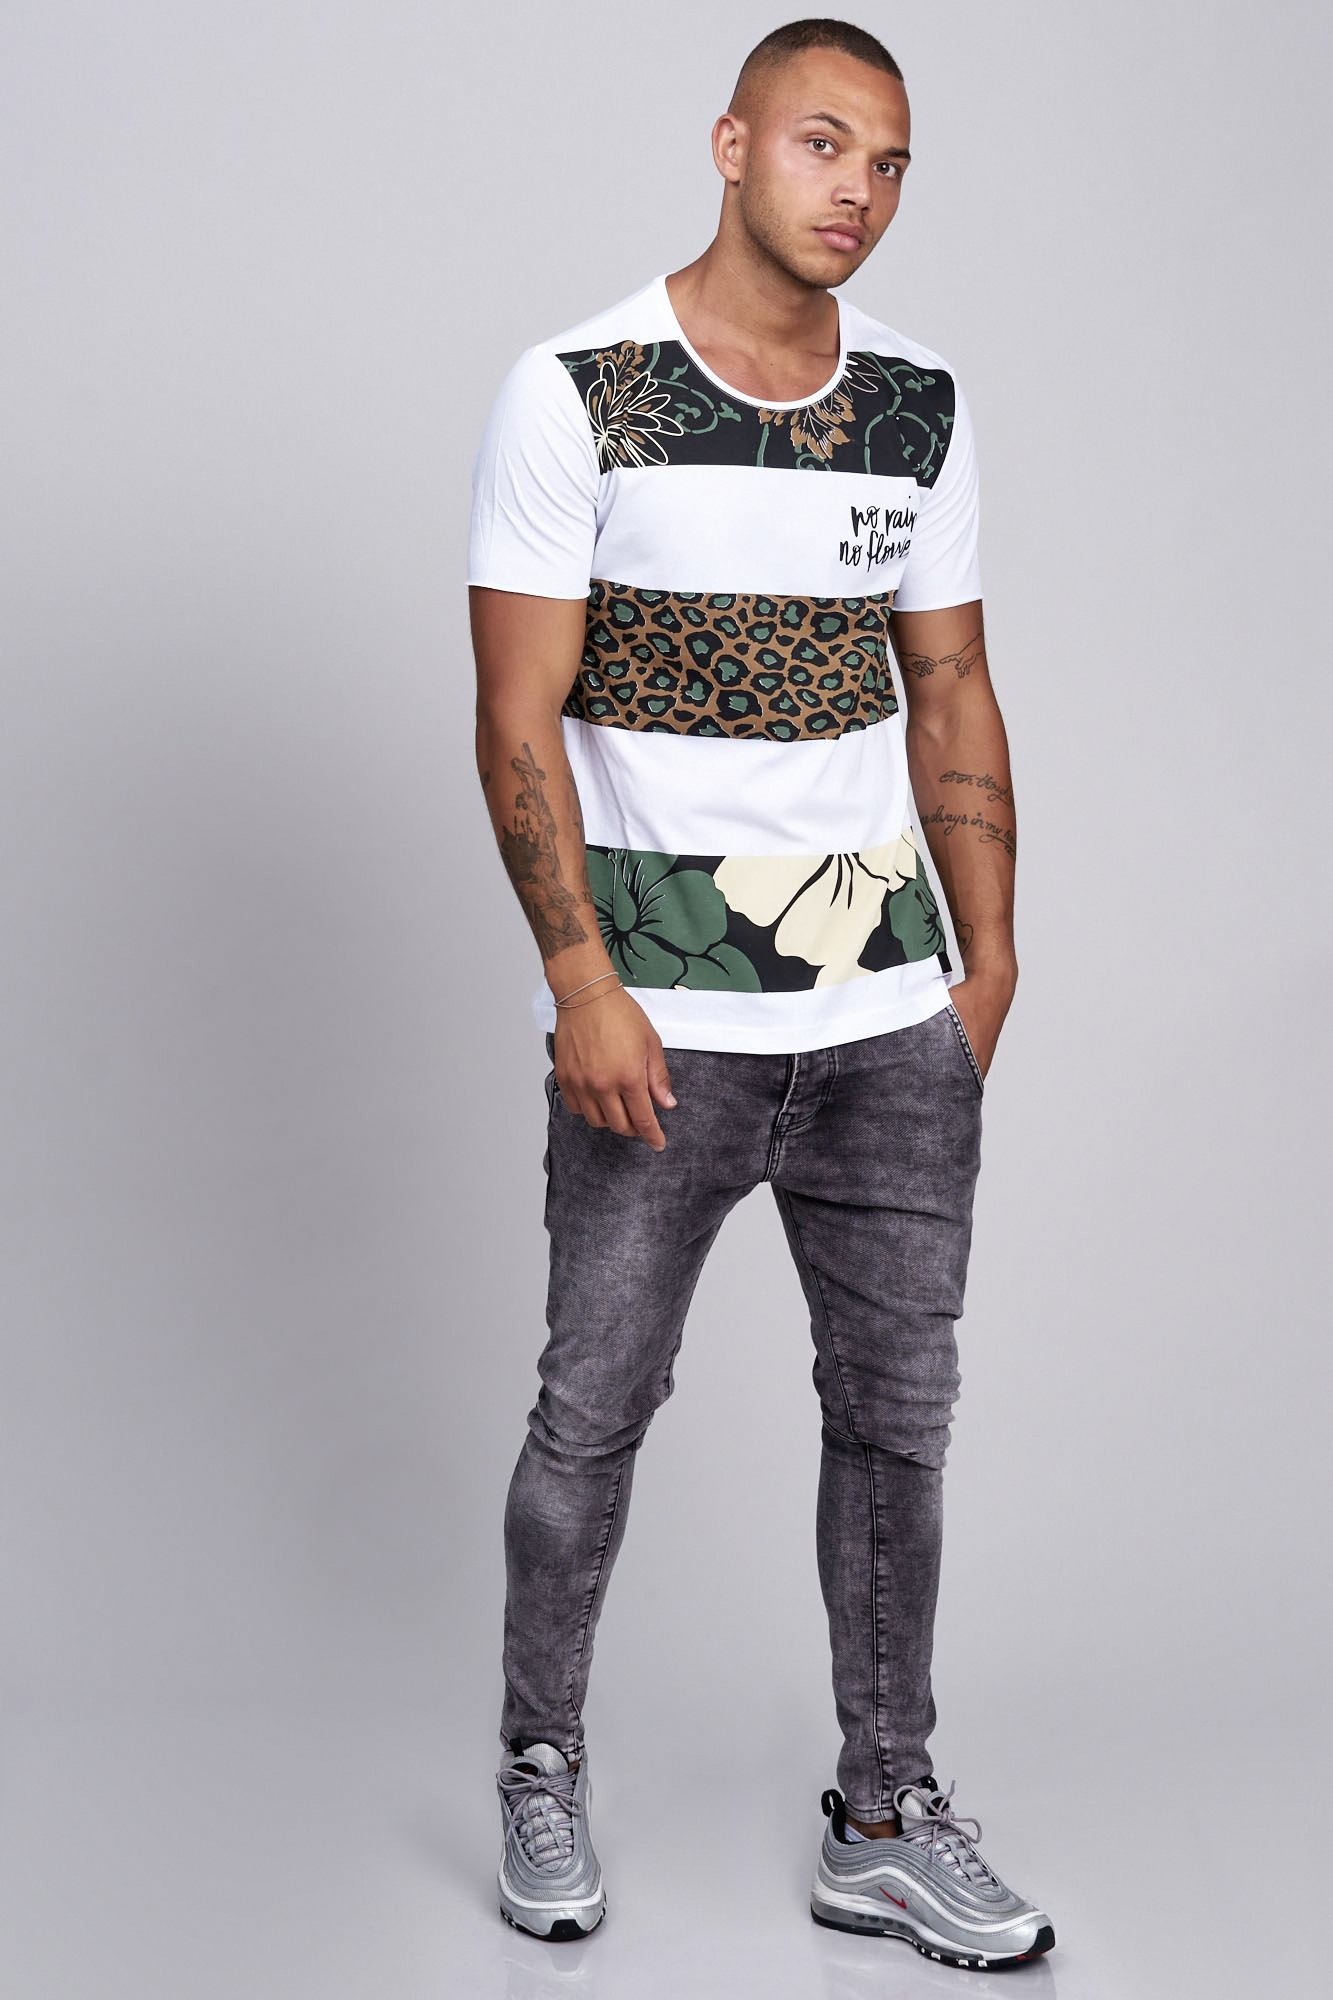 T-shirt-da-Uomo-Polo-Shirt-a-Maniche-Corte-printshirt-Polo-a-Maniche-Corte-17019-John-Kayna miniatura 22